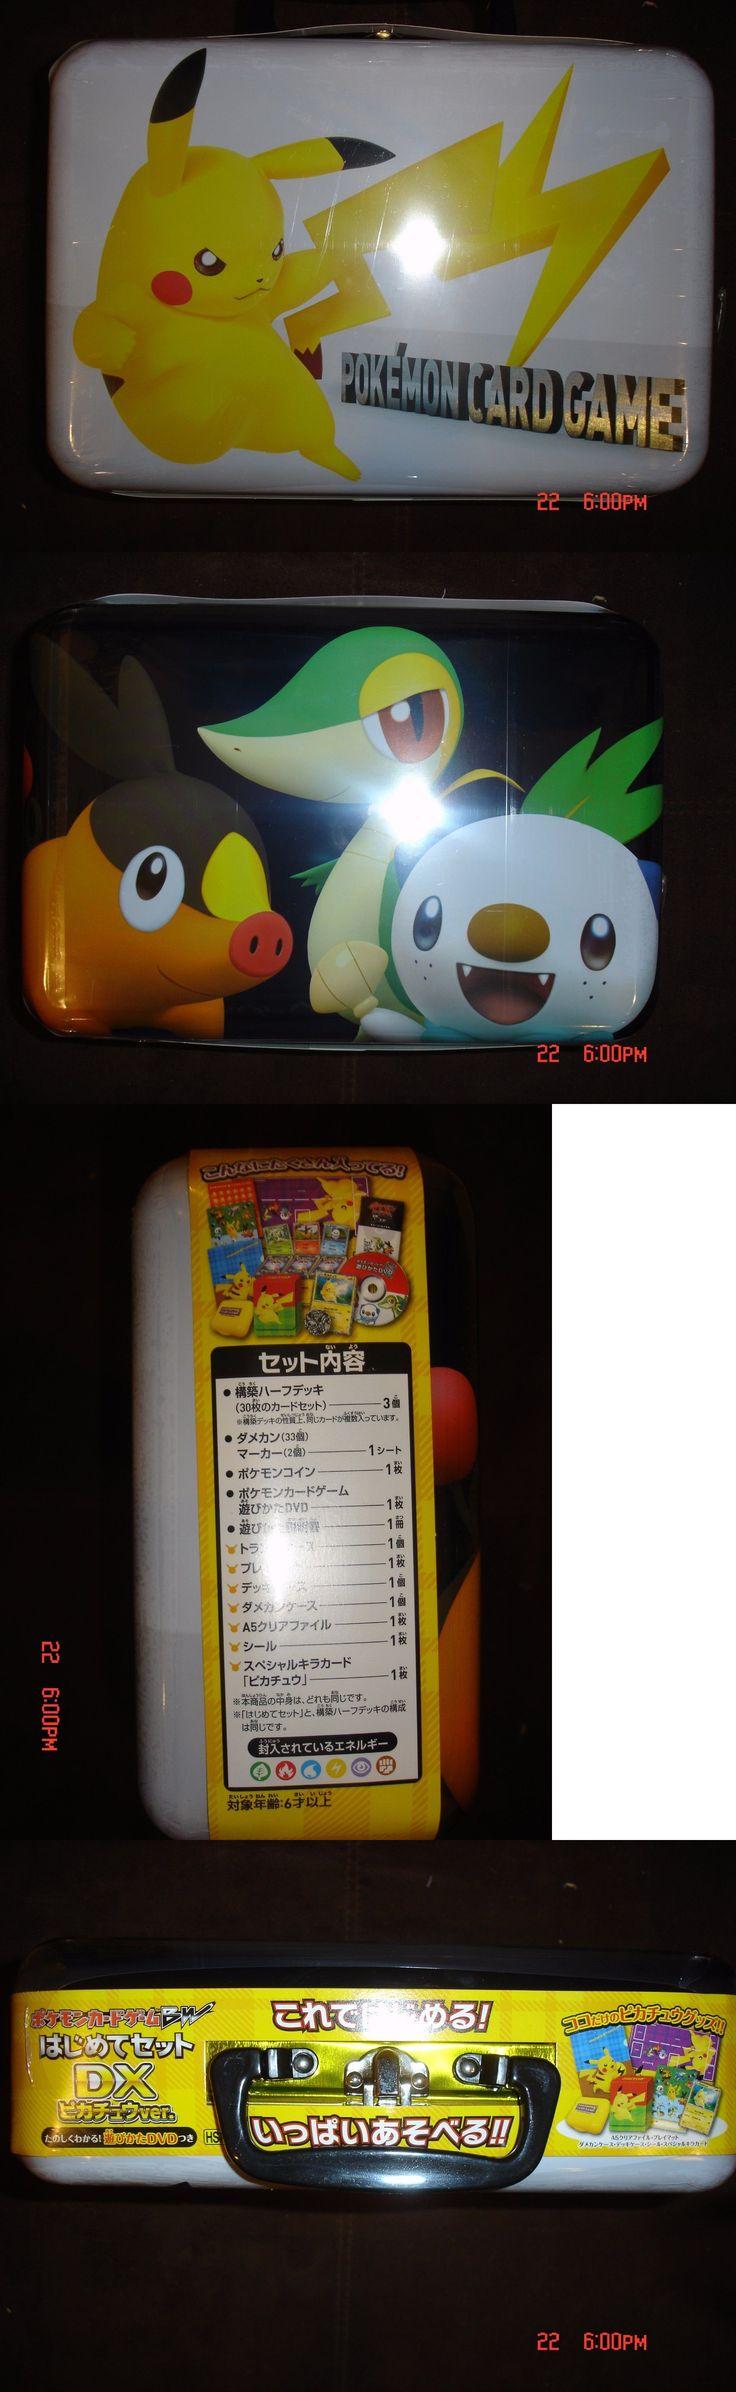 Pok mon Sealed Decks and Kits 183467: Sealed Japanese Pokemon Bw Beginning Set Pikachu Version 90 Cards Rare! 108 Bw-P -> BUY IT NOW ONLY: $79.99 on eBay!